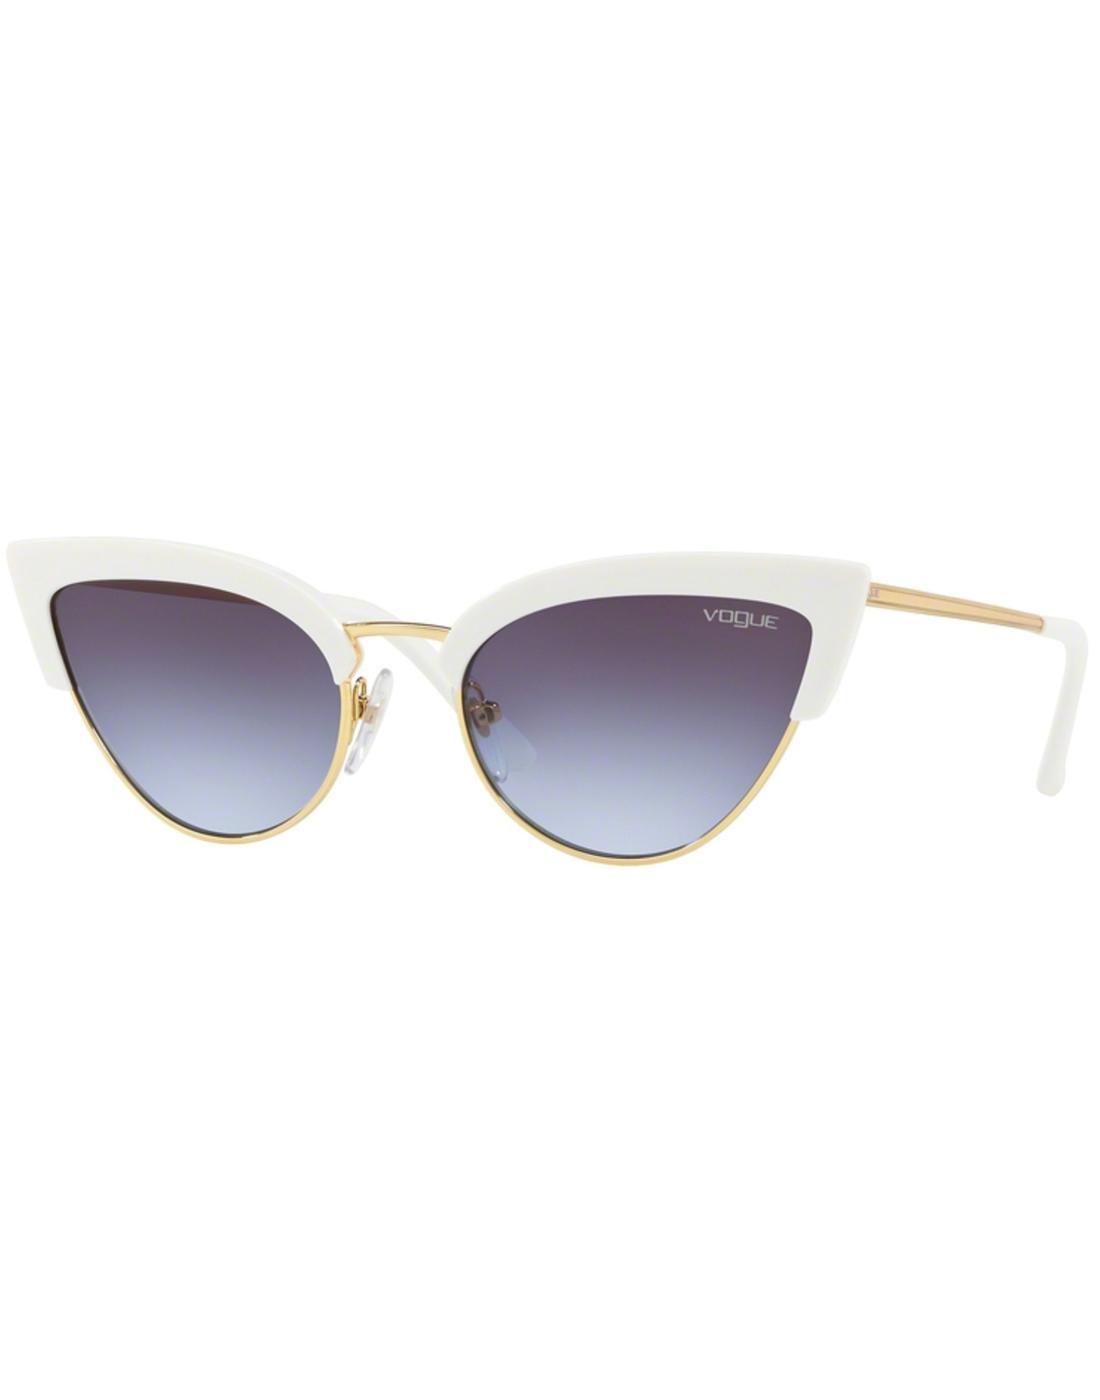 514cc89c1adf VOGUE Retro 50s Vintage Cats-Eye Sunglasses in White